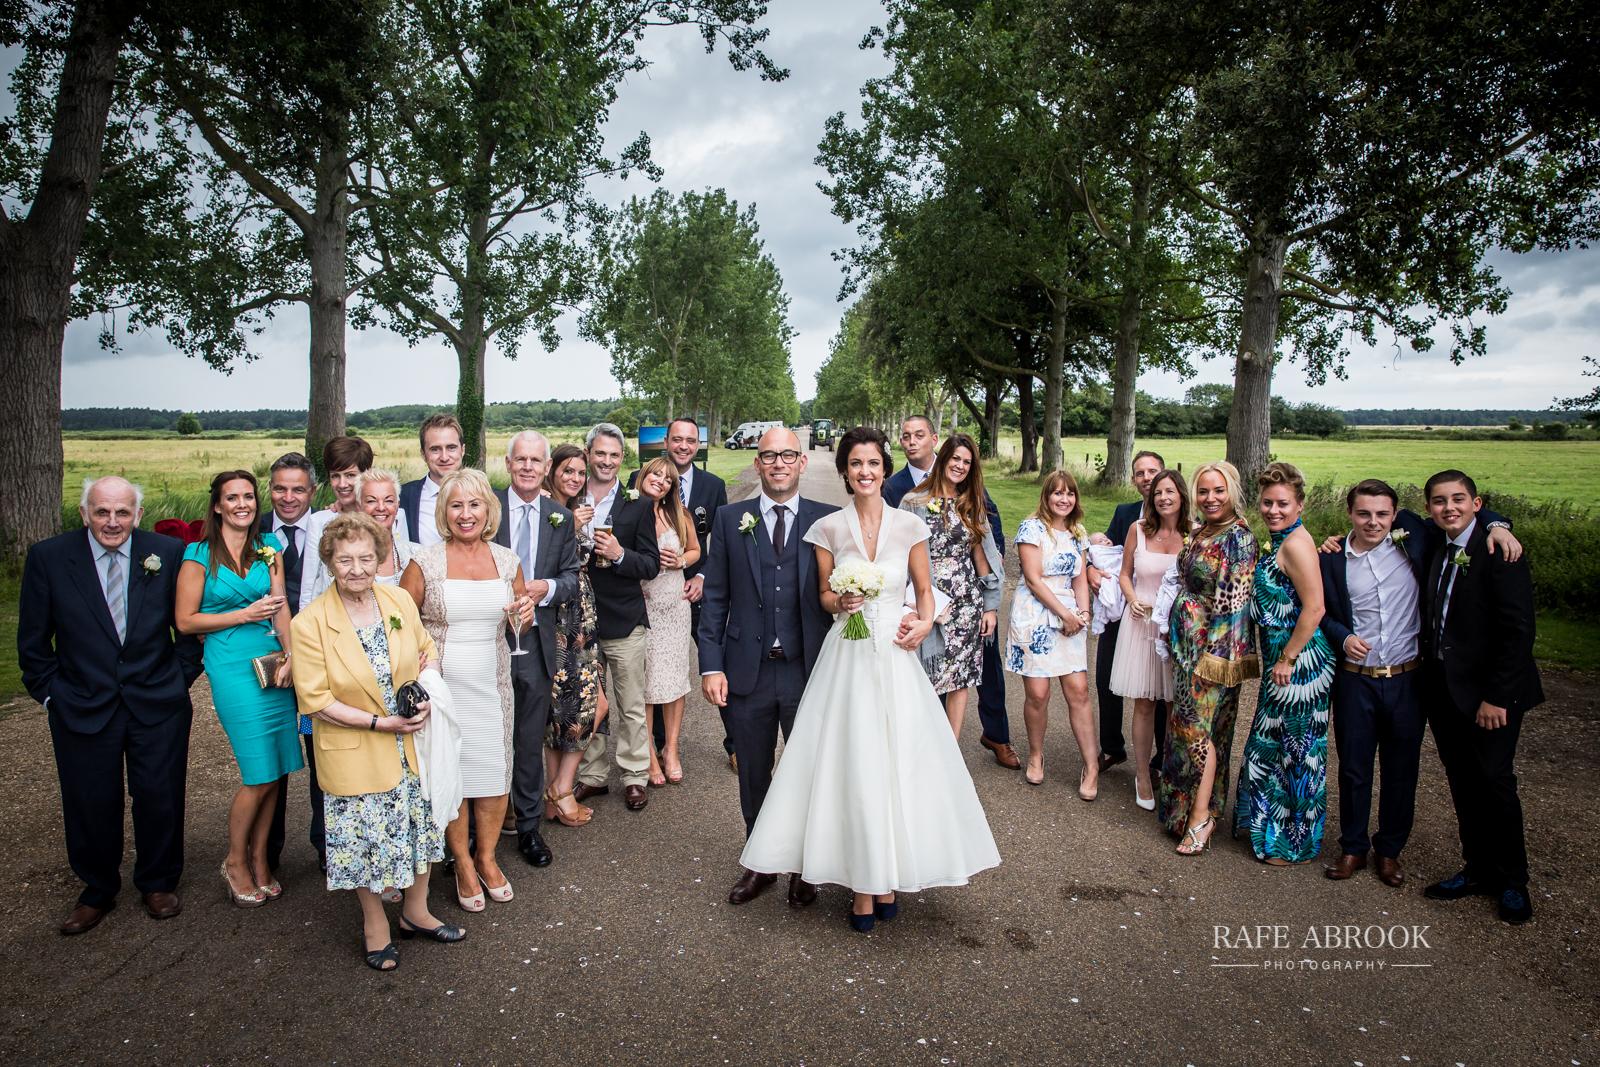 cley windmill wedding norfolk hertfordshire wedding photographer-1261.jpg